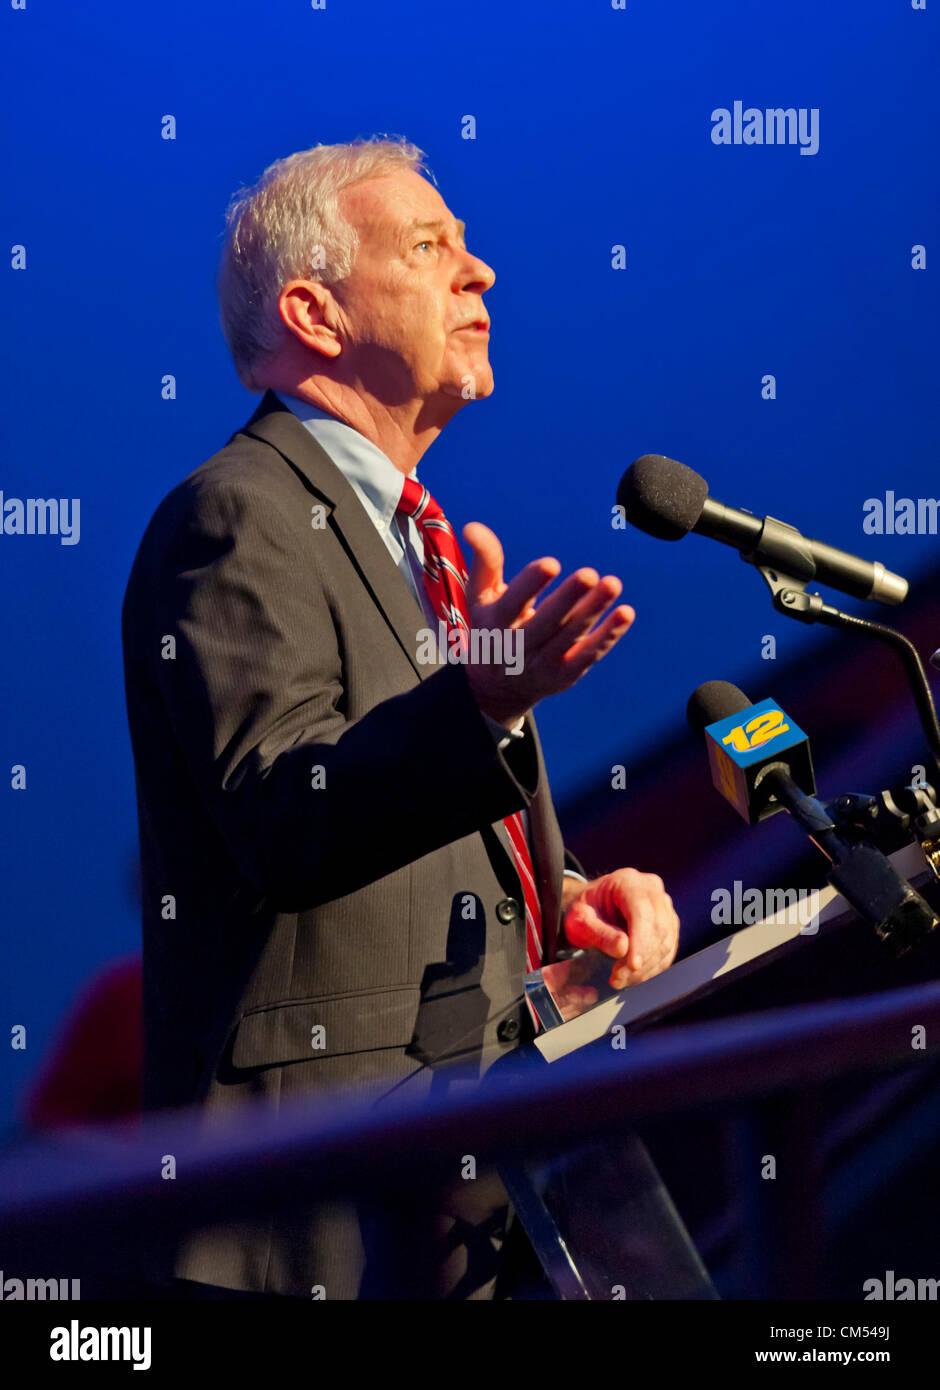 Oct 4, 2012 - GARDEN CITY, NEW YORK U.S. - NY State Senator KEMP HANNON, speaks at new JetBlue Sky Theater Planetarium - Stock Image